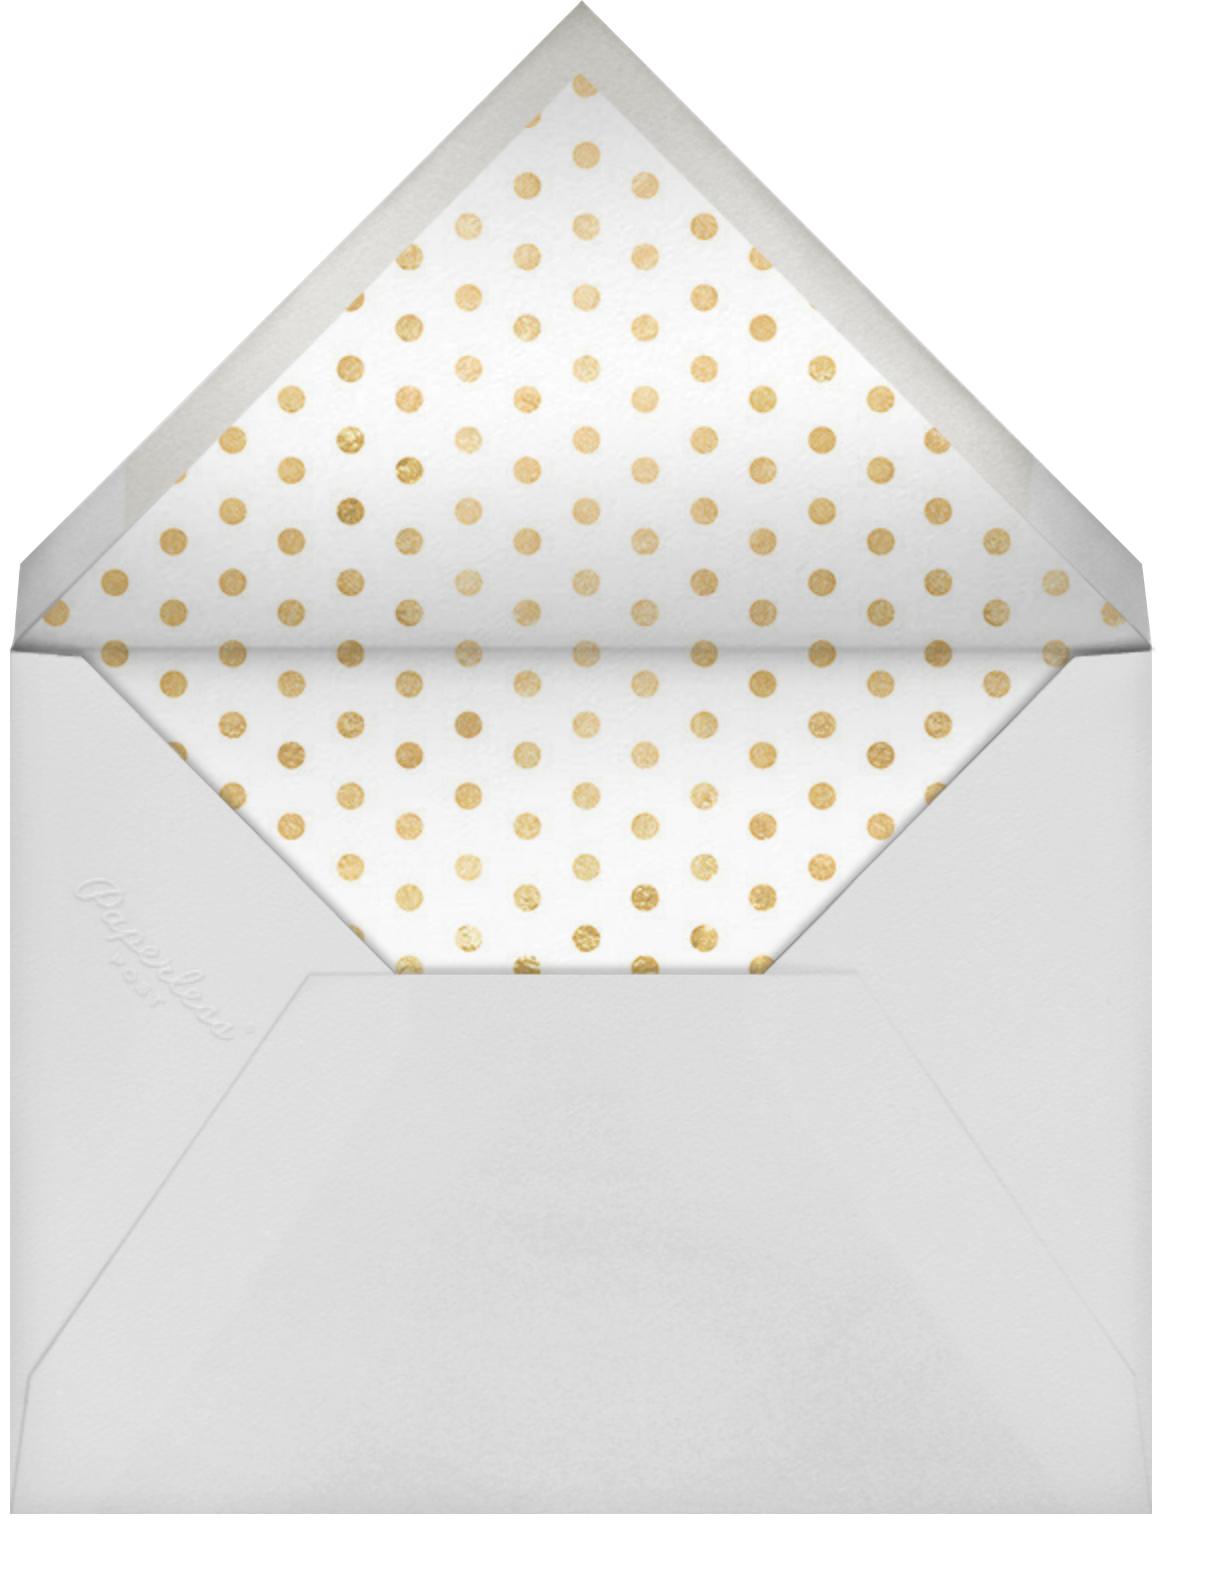 Layer Cake (Invitation) - Rifle Paper Co. - Kids' birthday - envelope back